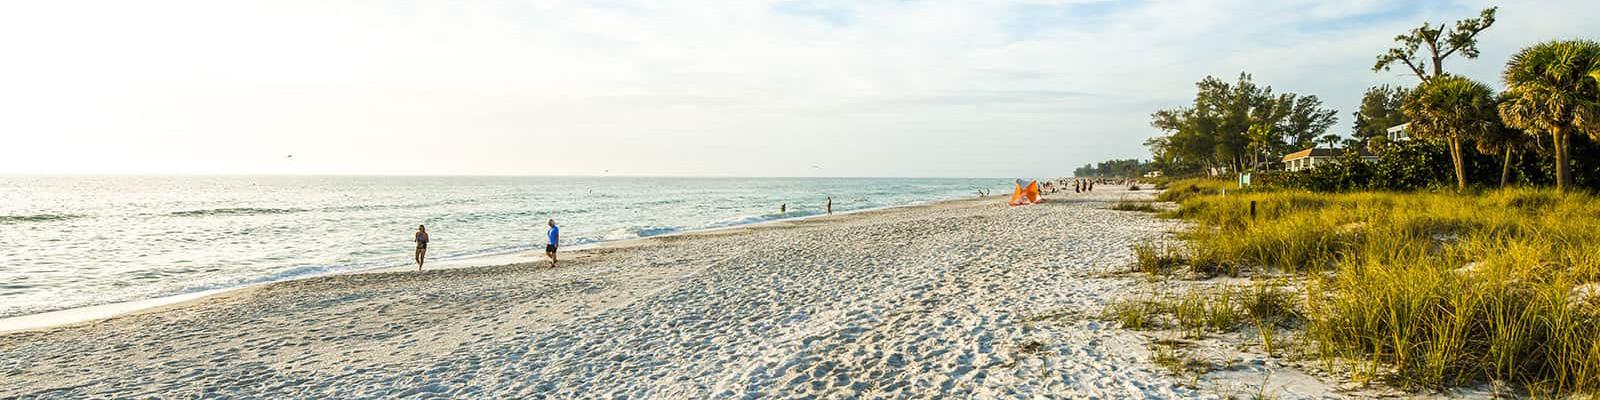 Bali Hai Beach Resort Vacation Rentals